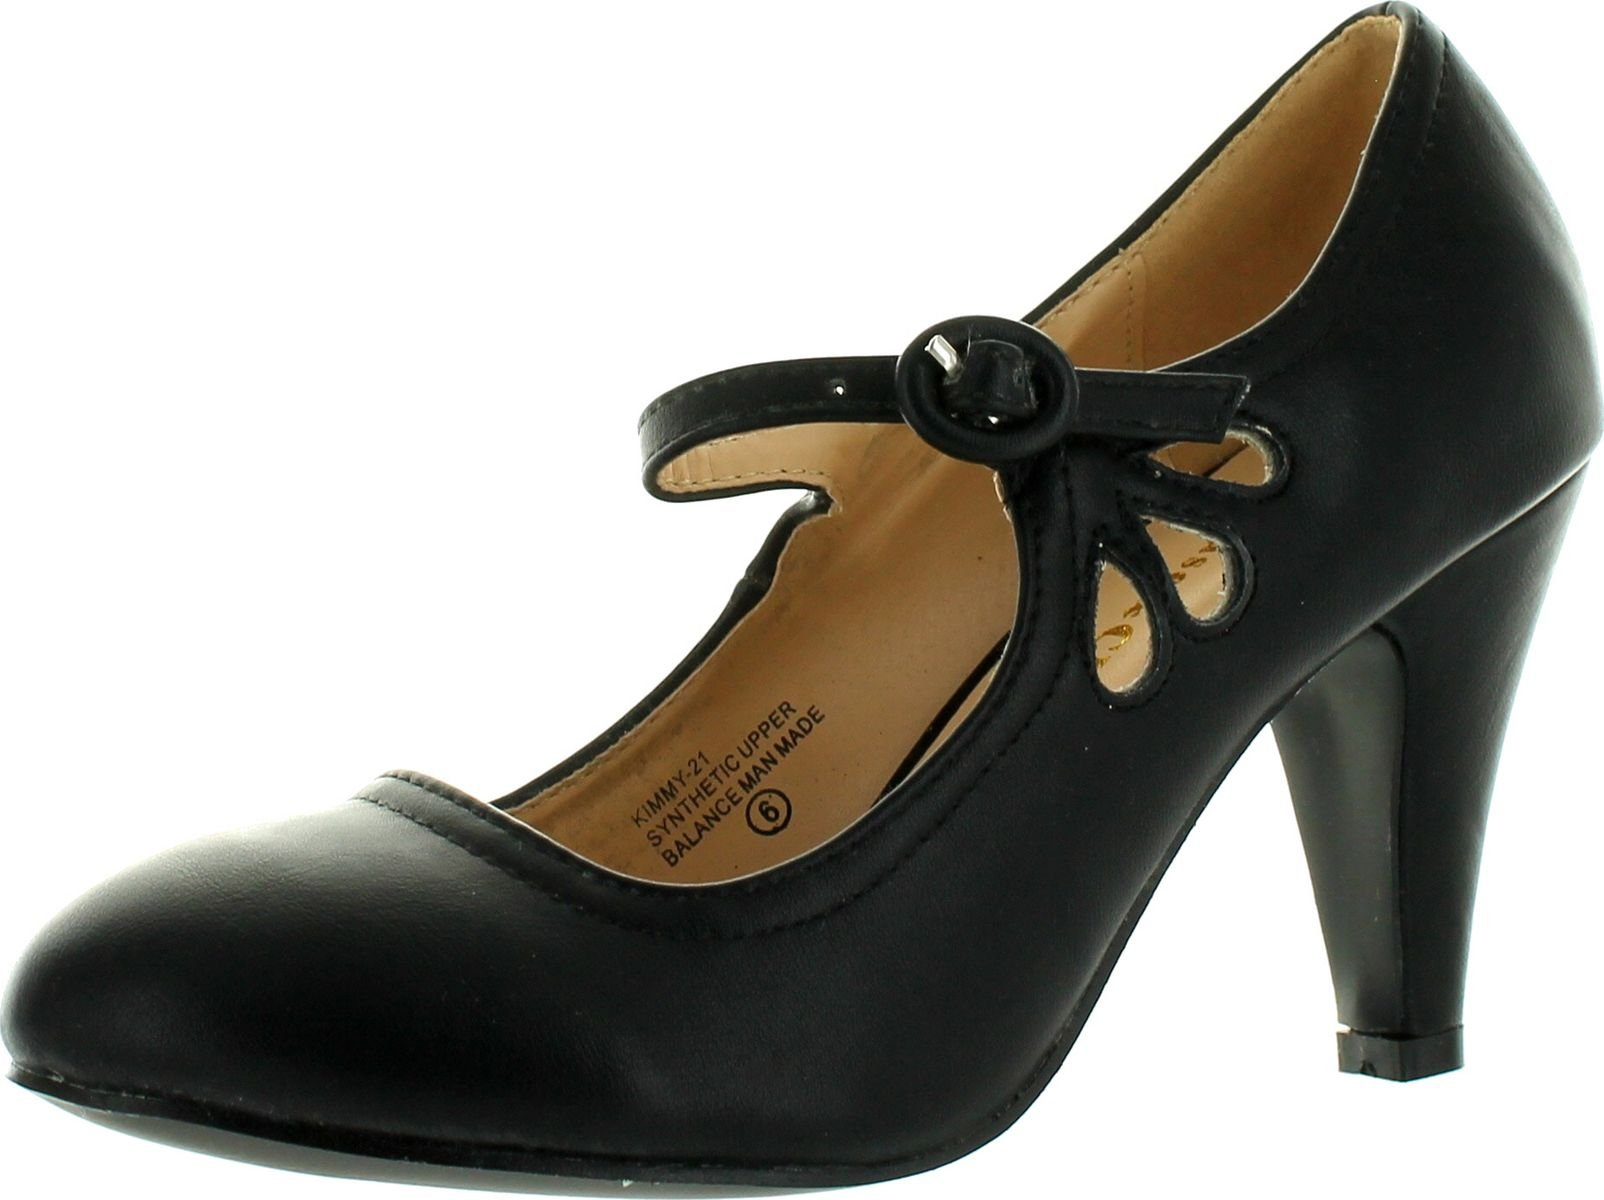 Chase & Chloe Kimmy-21 Women's Round Toe Pierced Mid Heel Mary Jane Style Dress Pumps (11 B(M) US, Black)